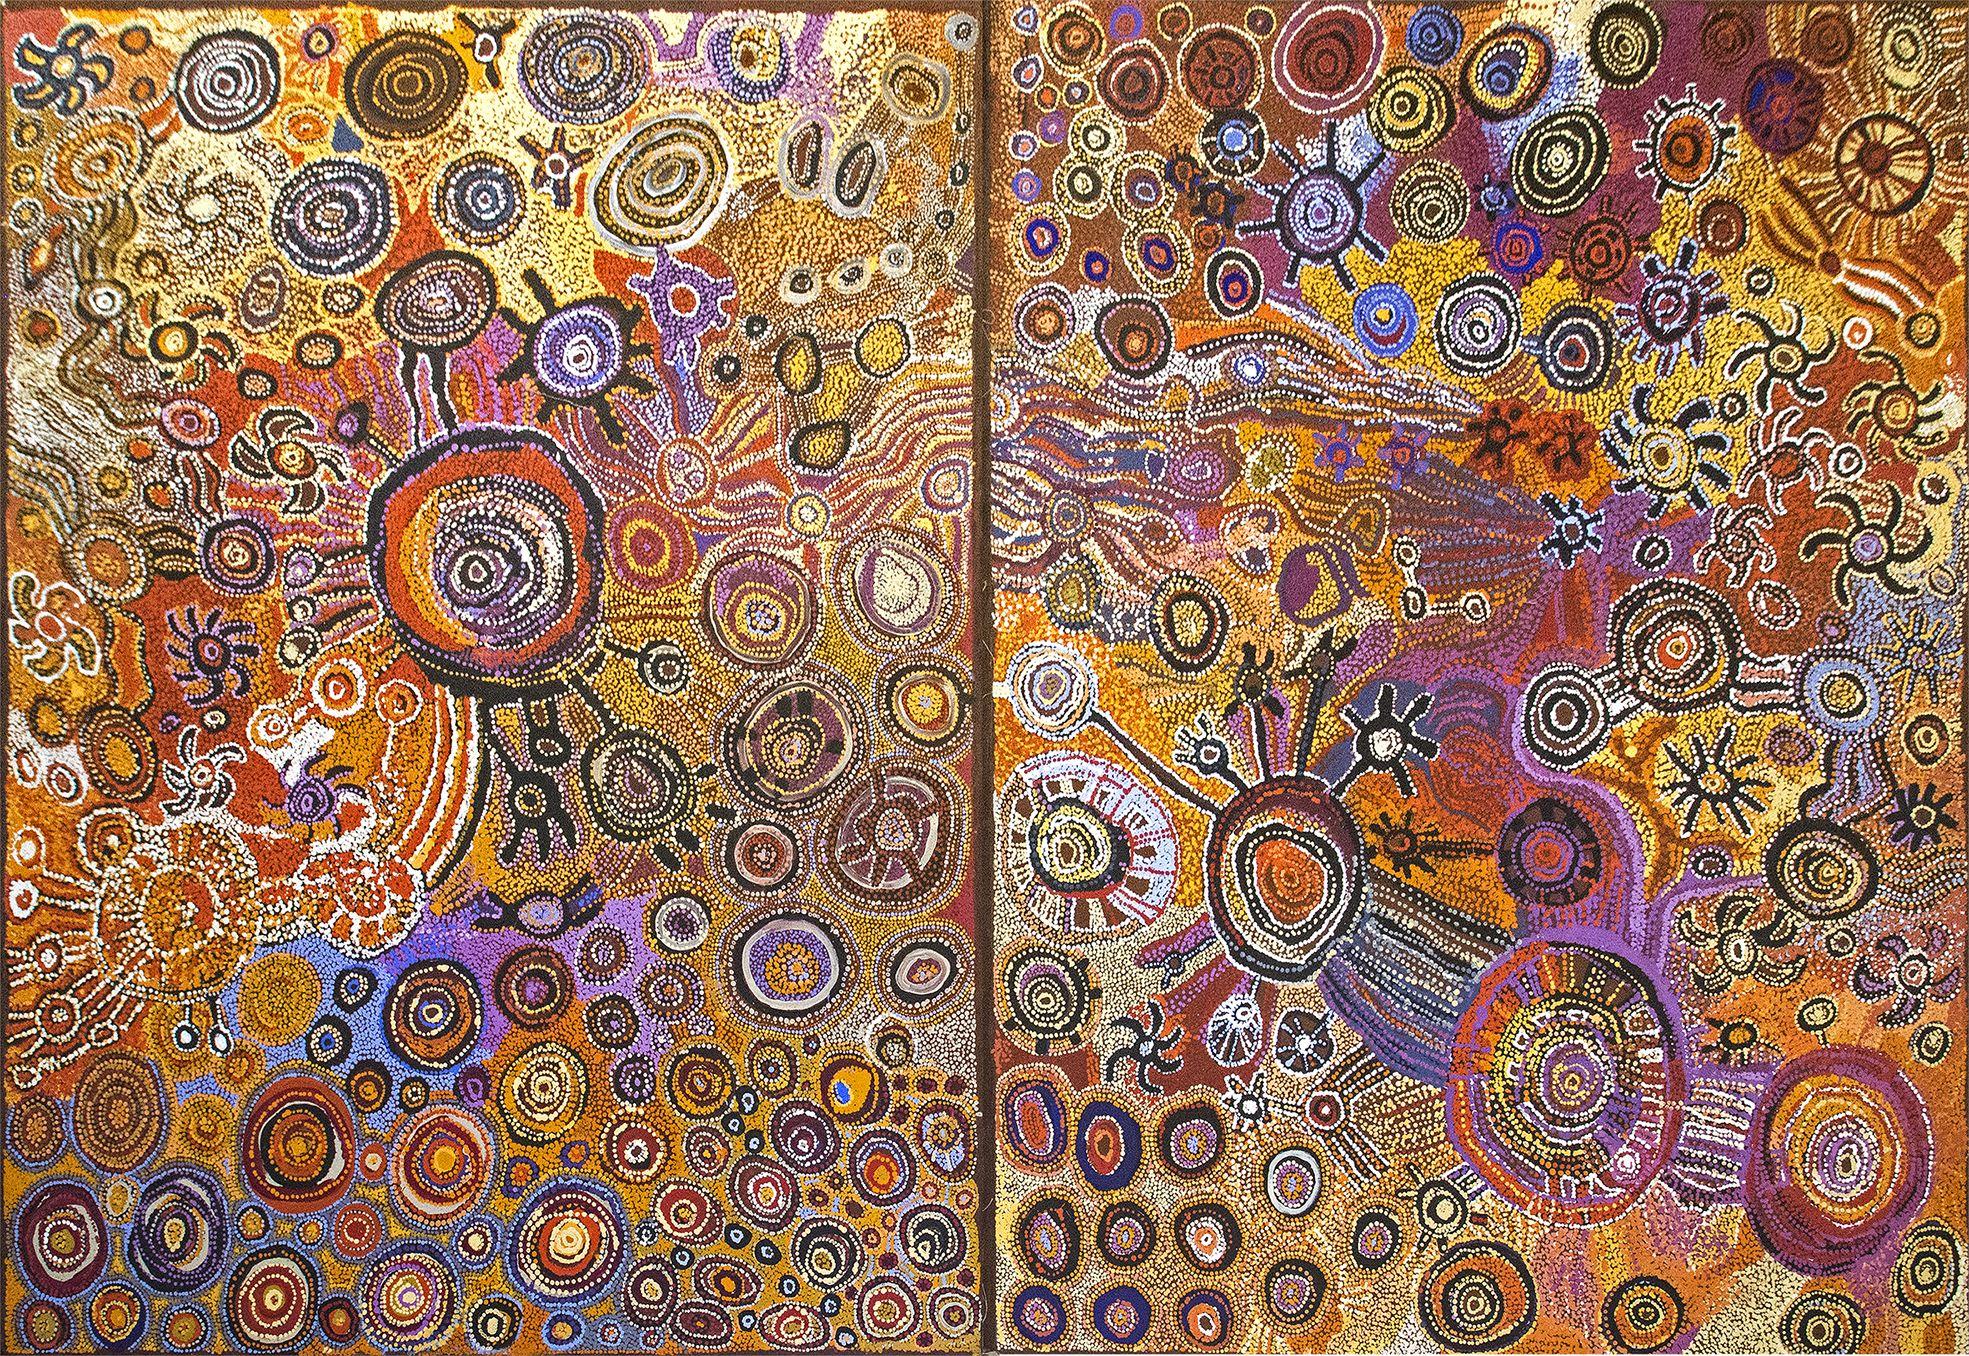 Major Women Collaborative - 300 x 200 cm. Artiste : Senior Women from Fregon. Format : 2 x 153 x 200 cm. © Photo Aboriginal Signature with the courtesy of the artist and Kaltjiti Art